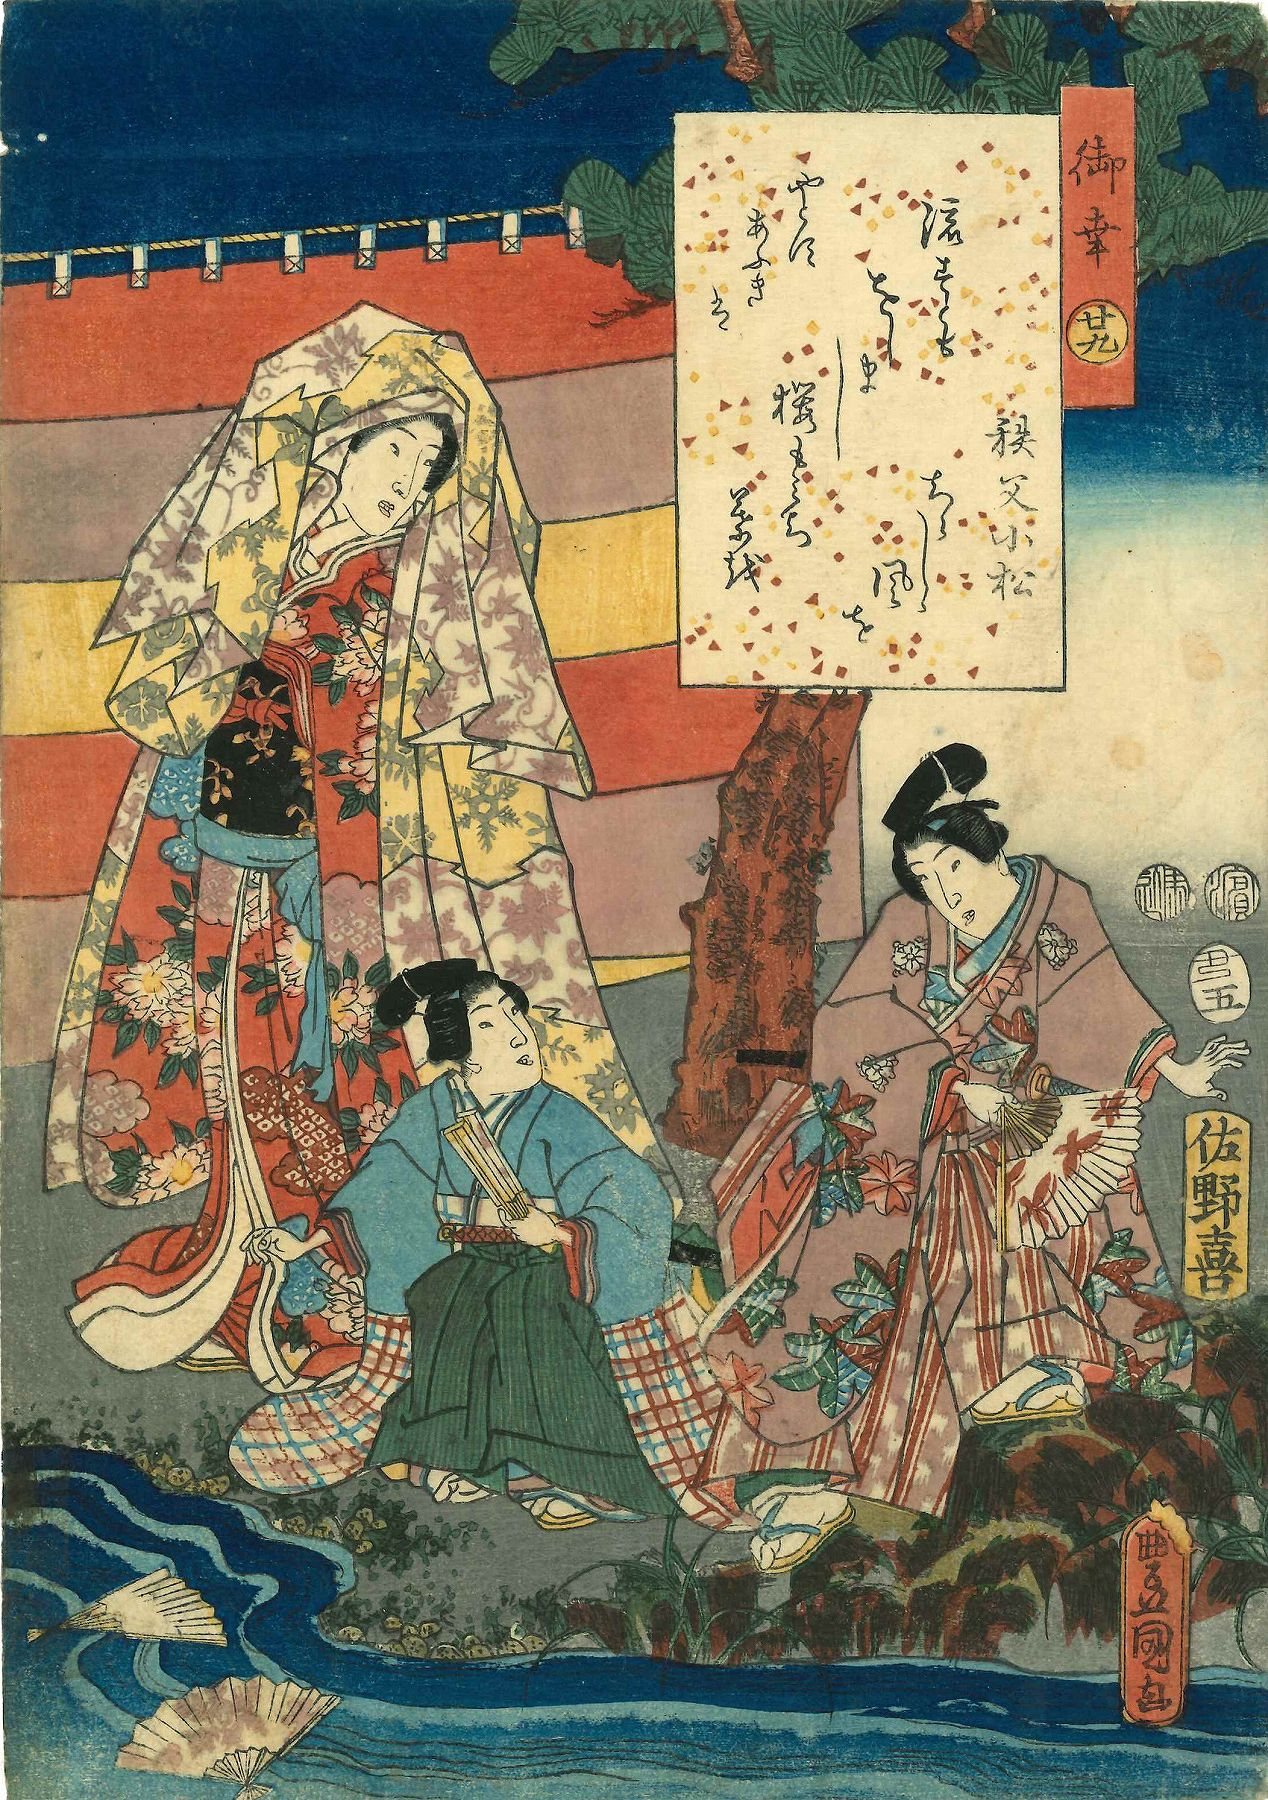 TOYOKUNI III Chapter 29, Miyuki, from Genji monogatari (Tale of Genji)